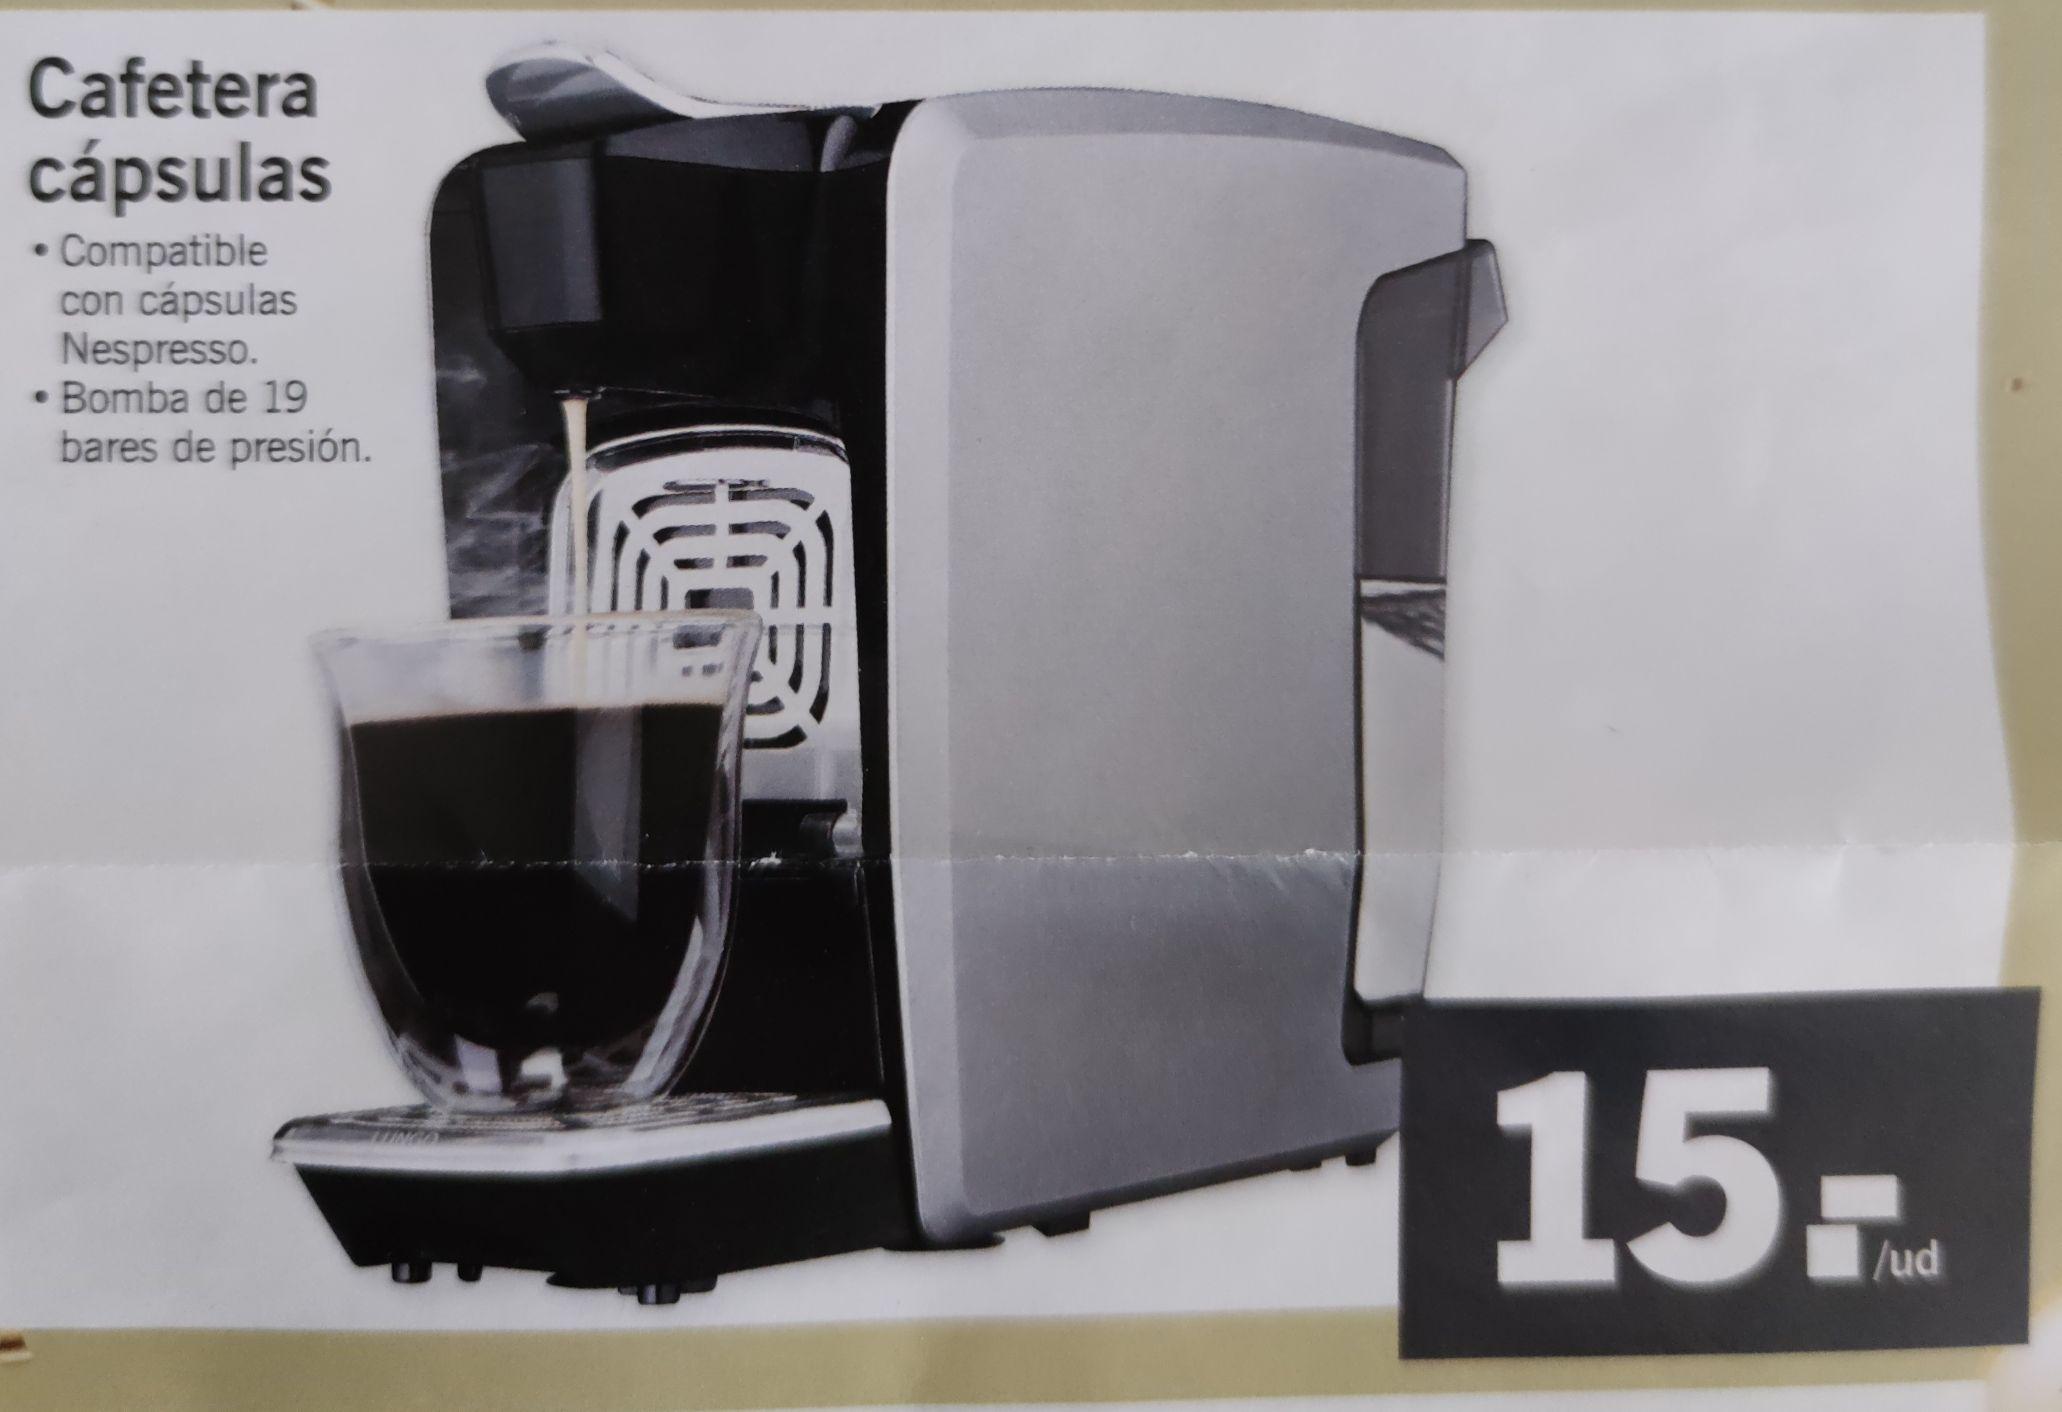 Cafetera cápsulas tipo Nespresso